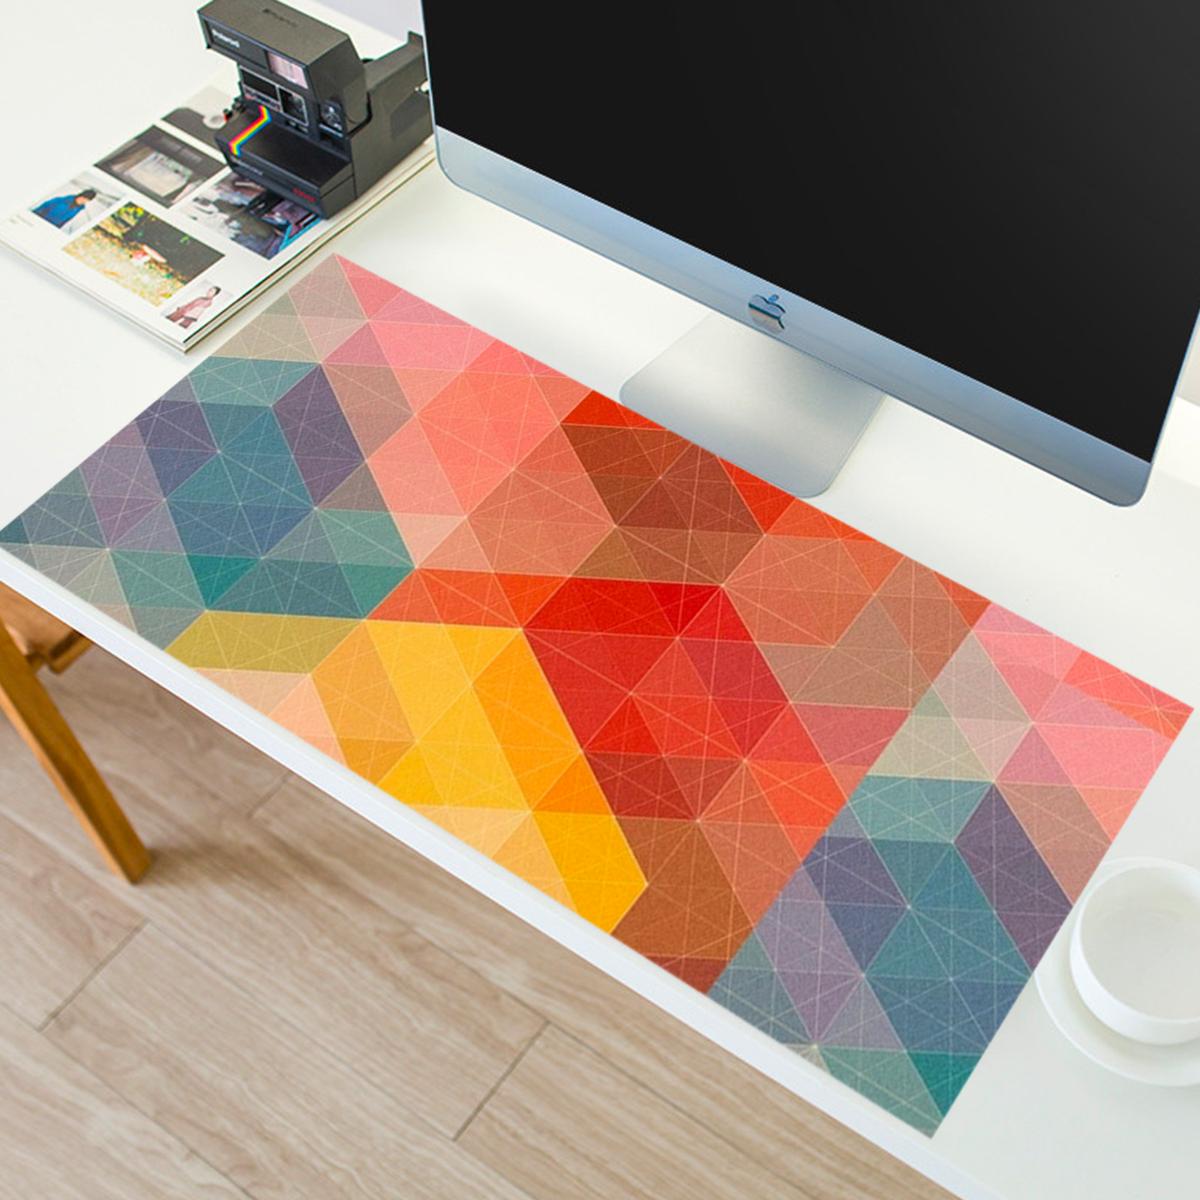 Pastel Desk Pad The Modern Stationery In 2020 Desk Pad Modern Desk Pad Design